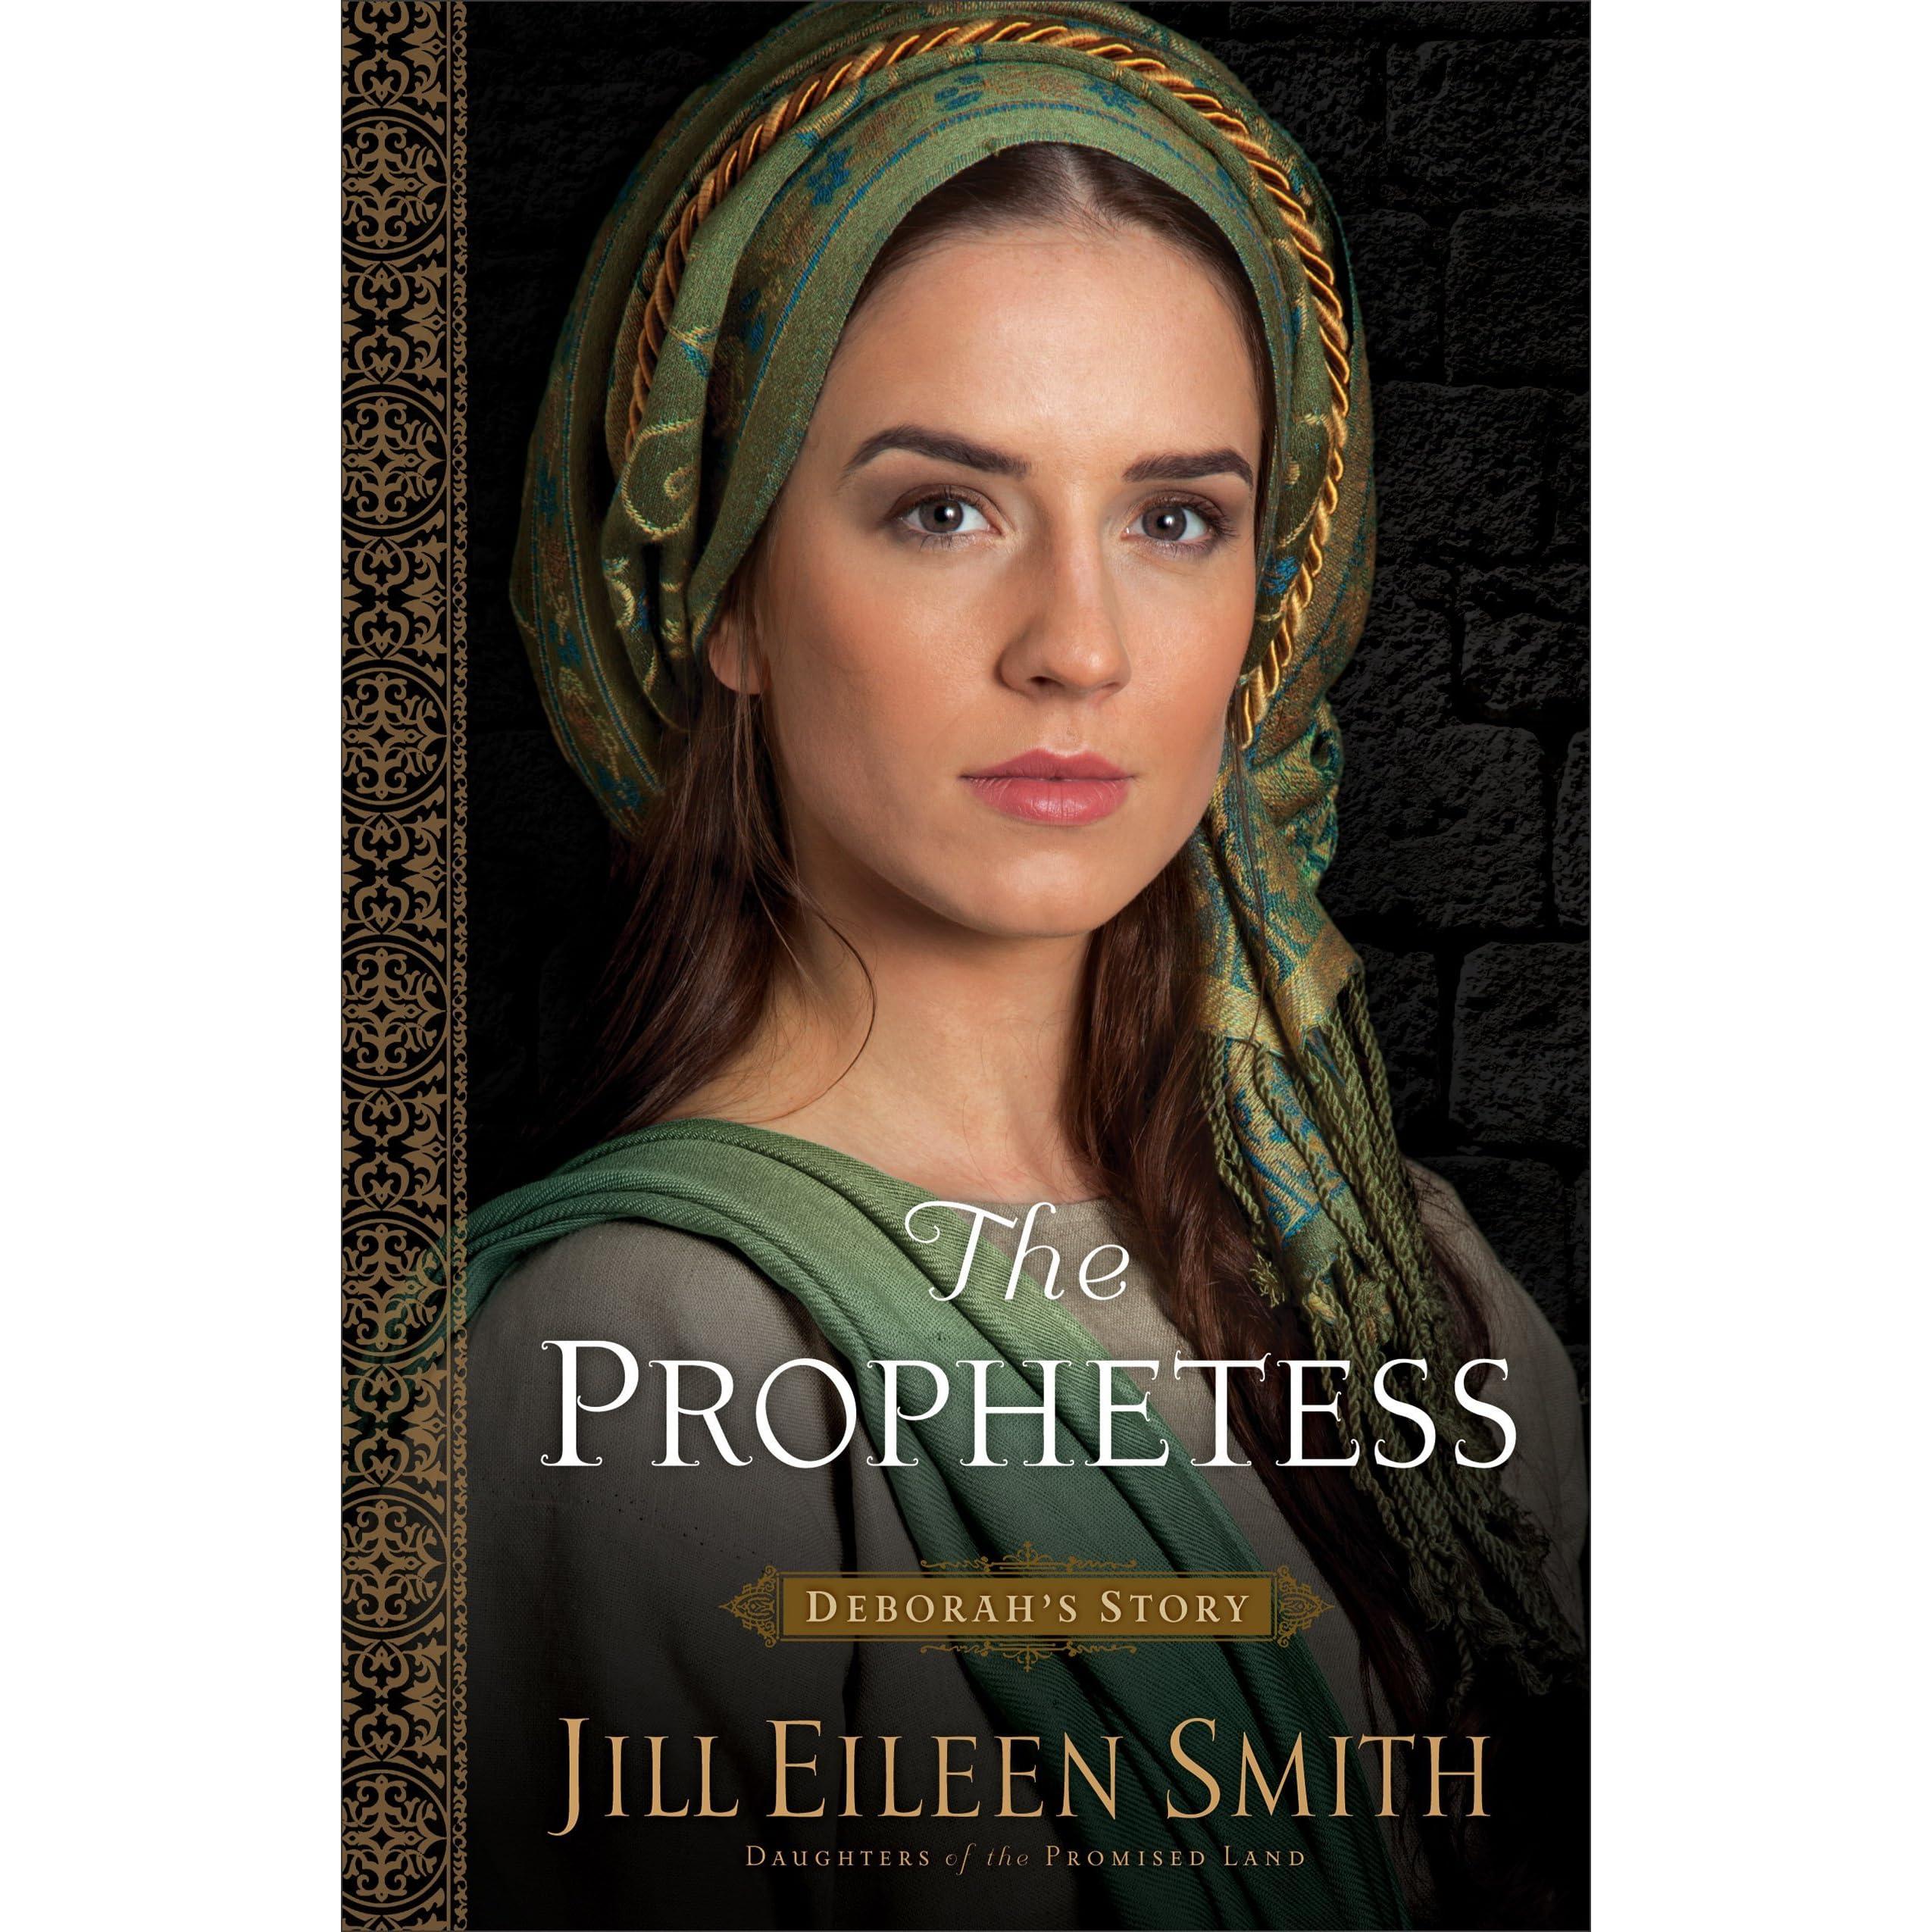 The Prophetess: Deborah's Story by Jill Eileen Smith